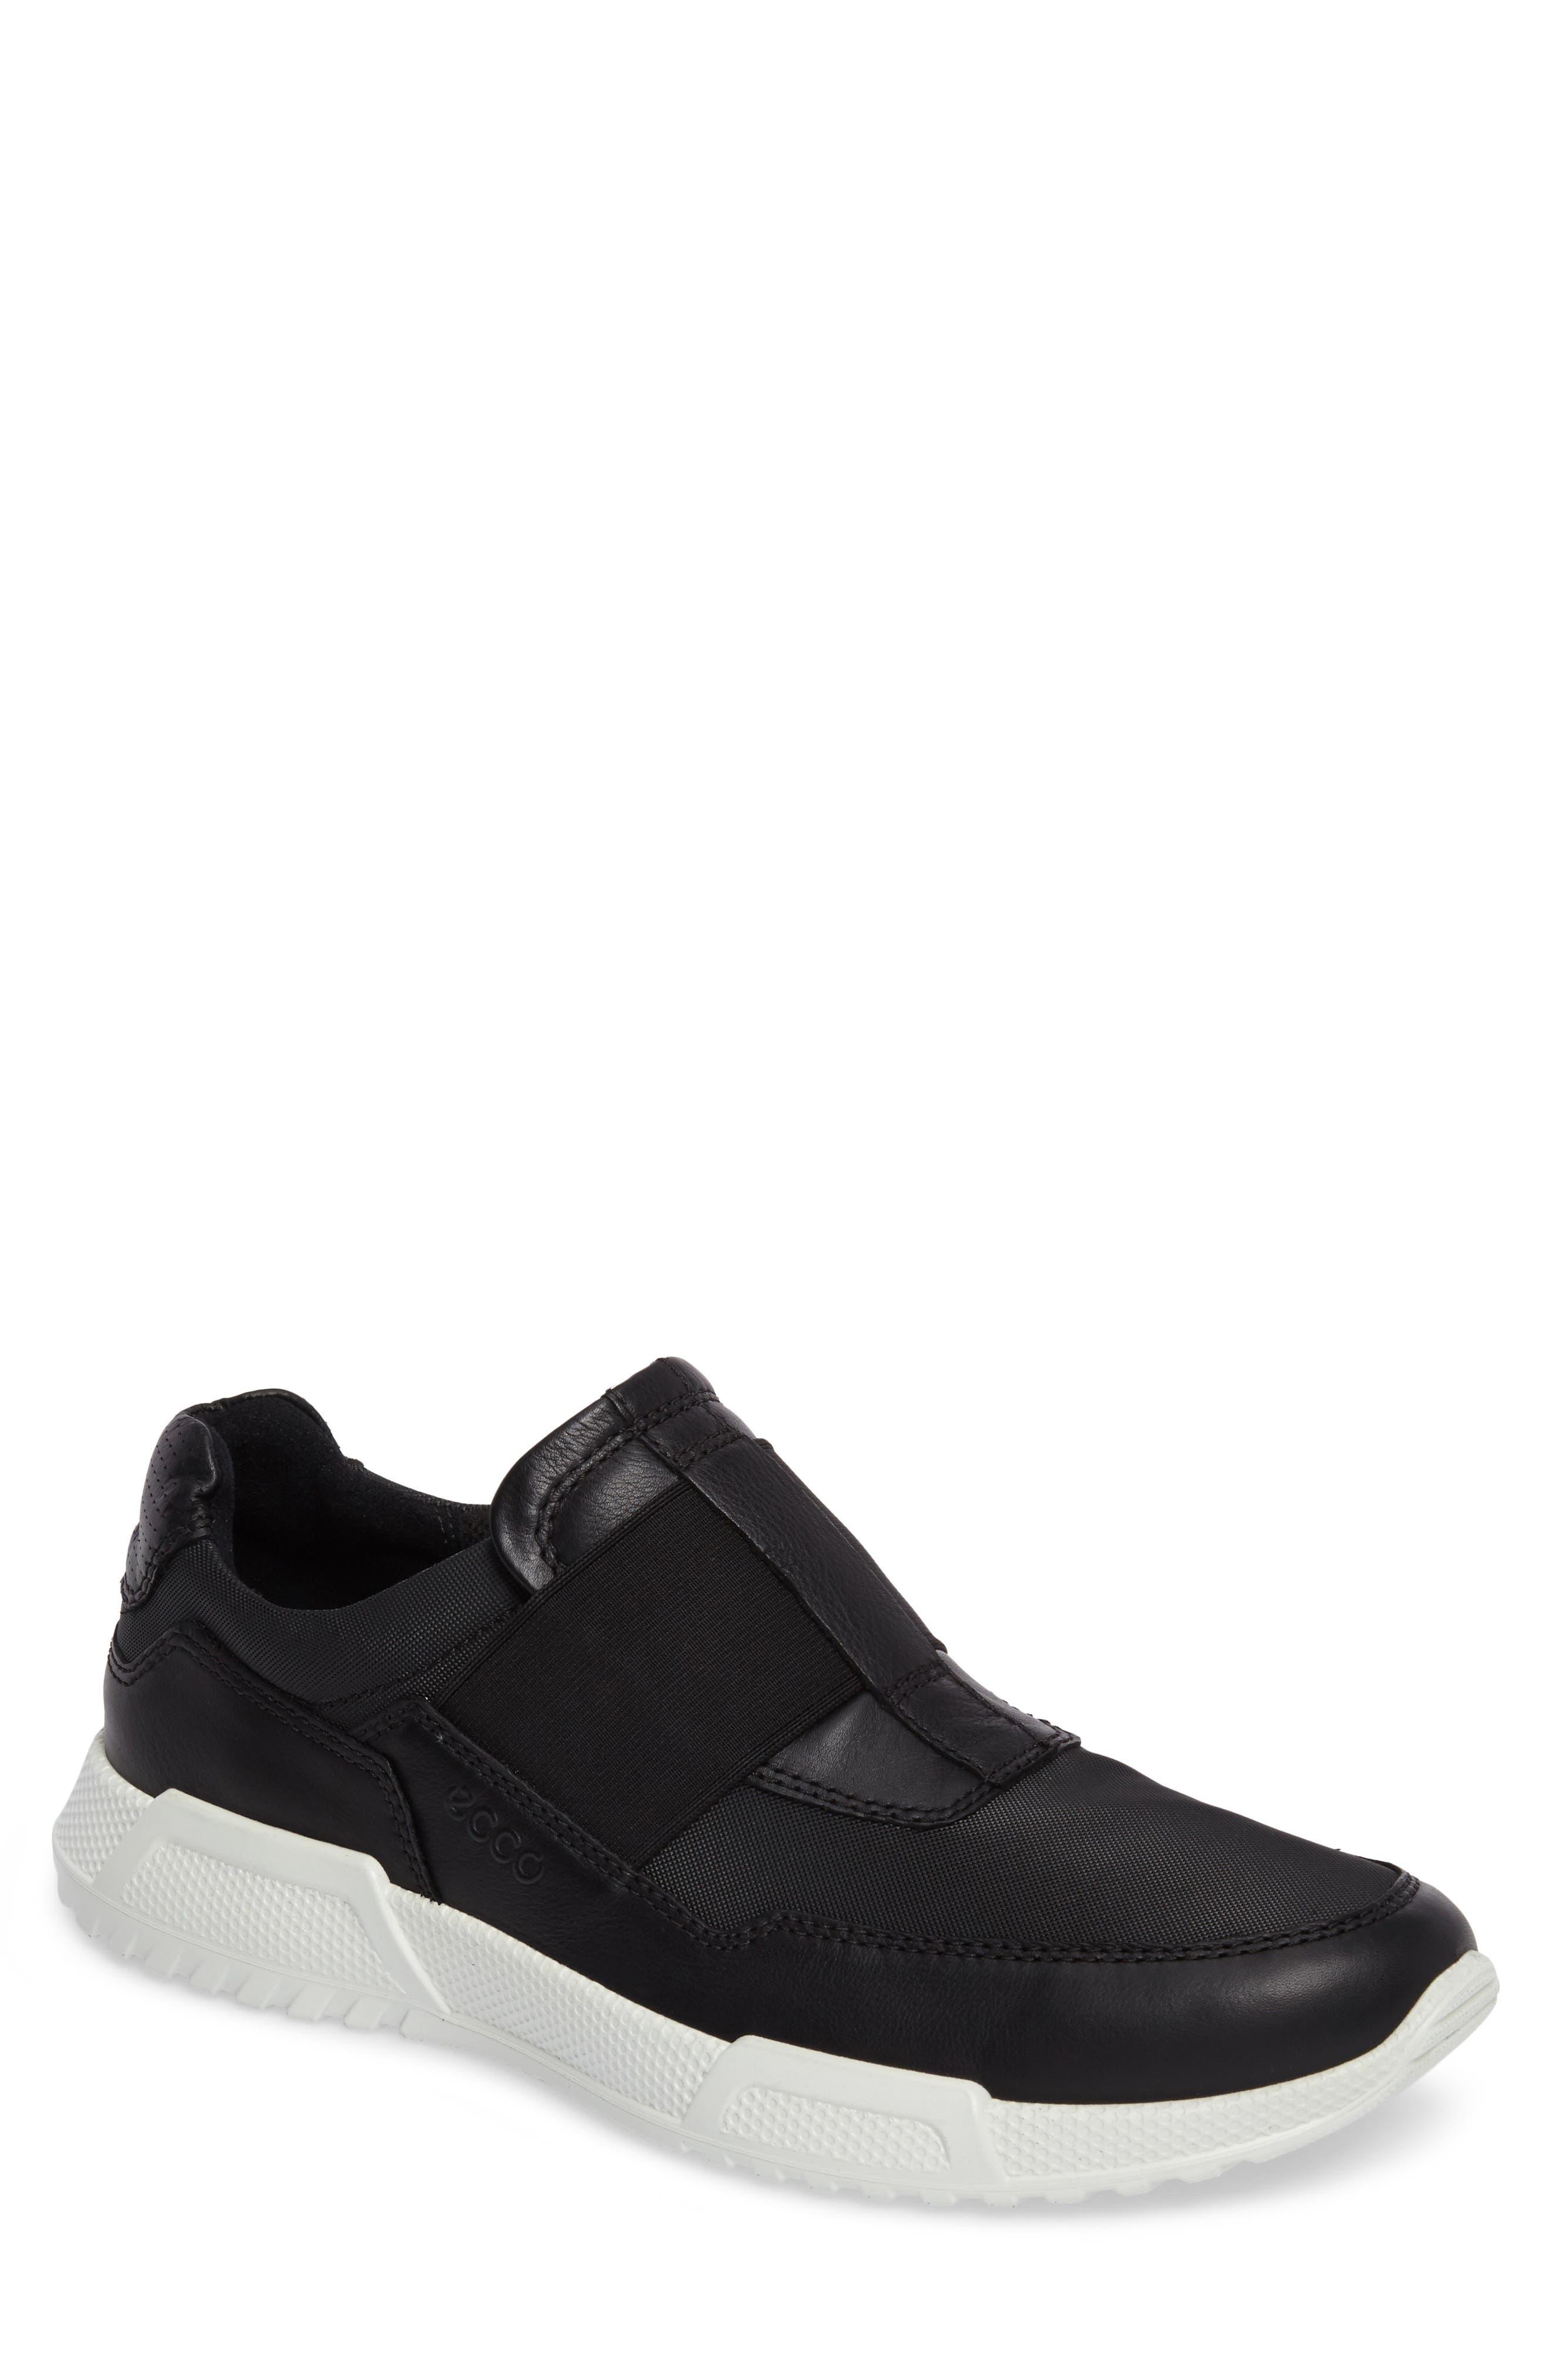 ECCO Luca Slip-On Sneaker (Men)